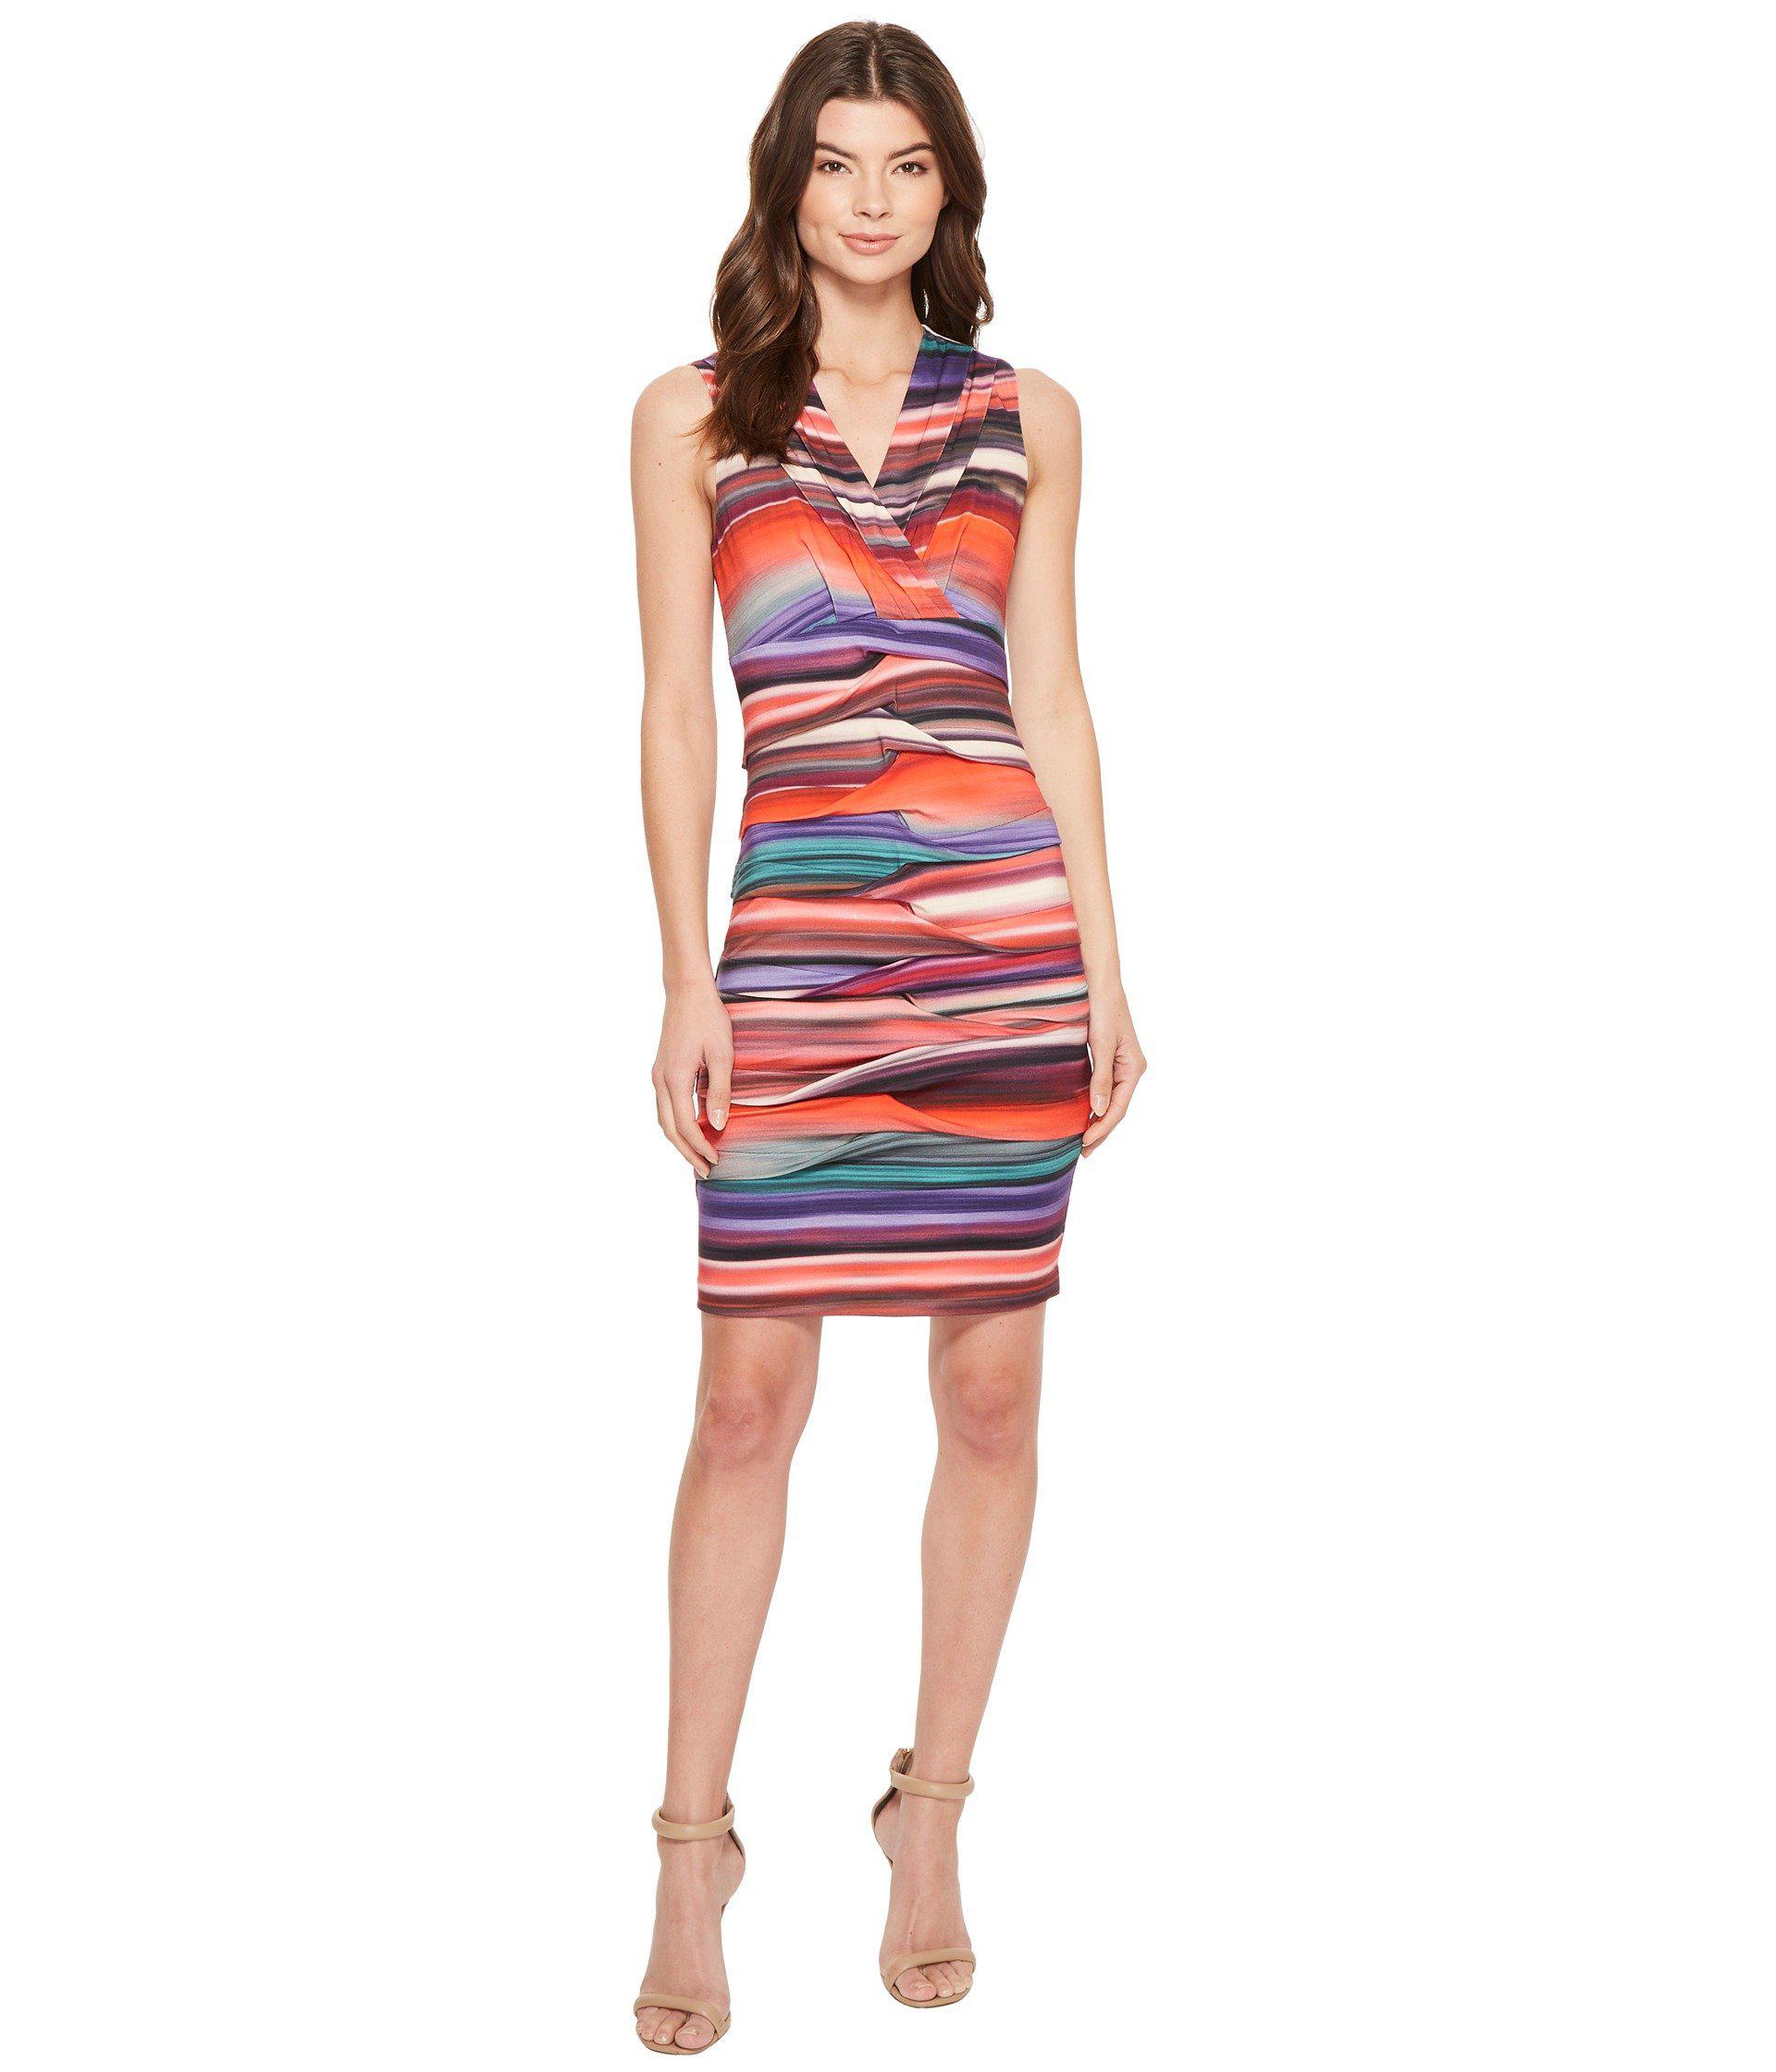 Lyst - Nicole Miller Abalone Stripe Dakota V-neck Dress in Red ...